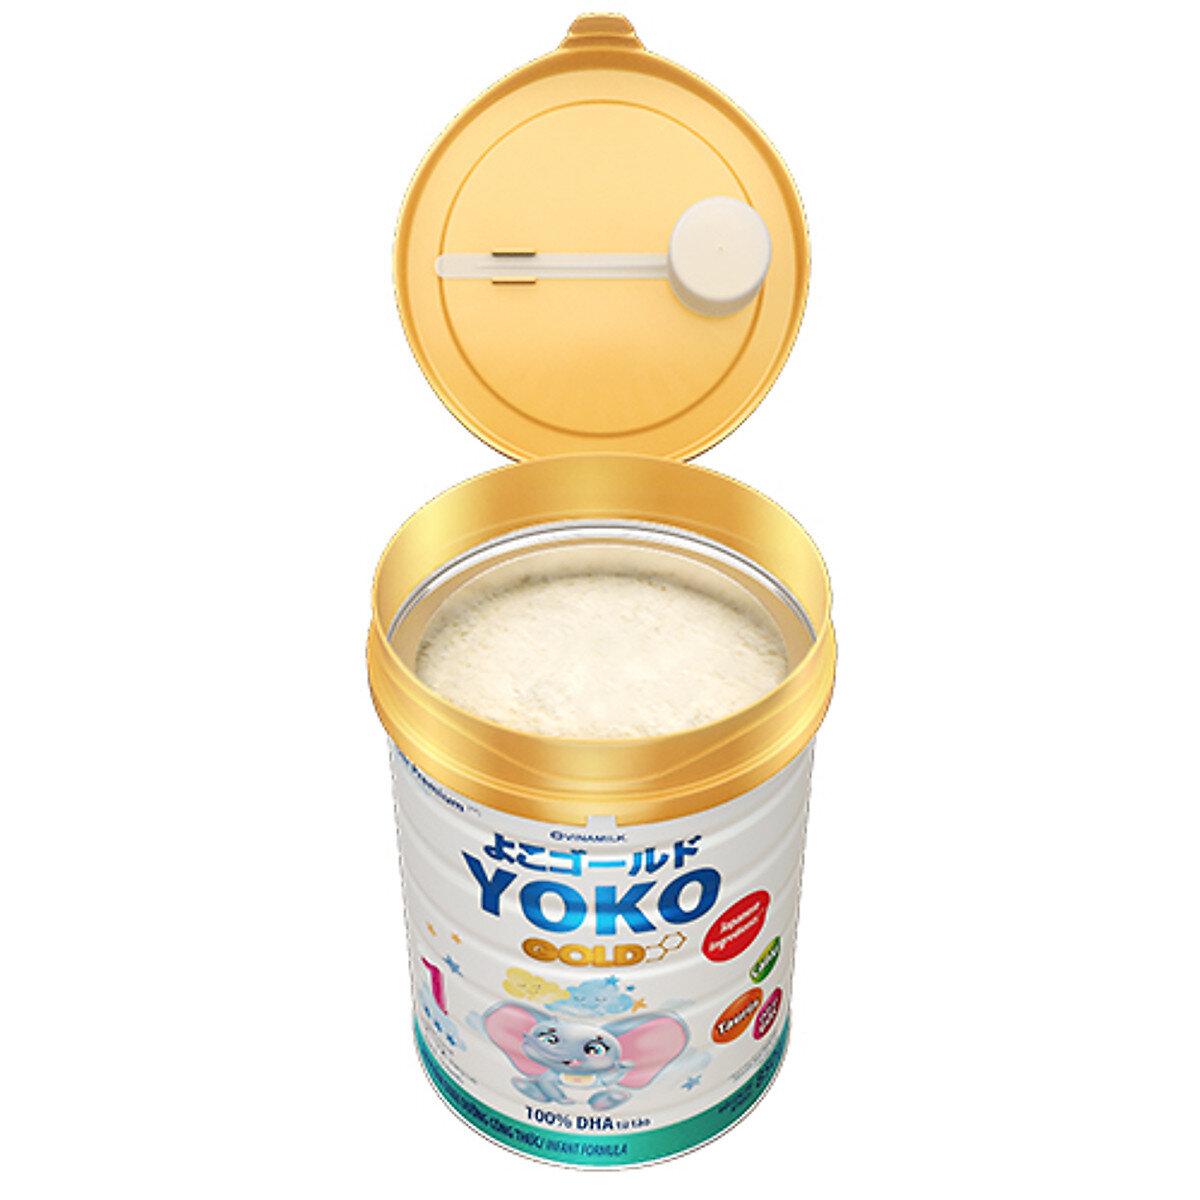 Kết cấu sữa Yoko Gold 1